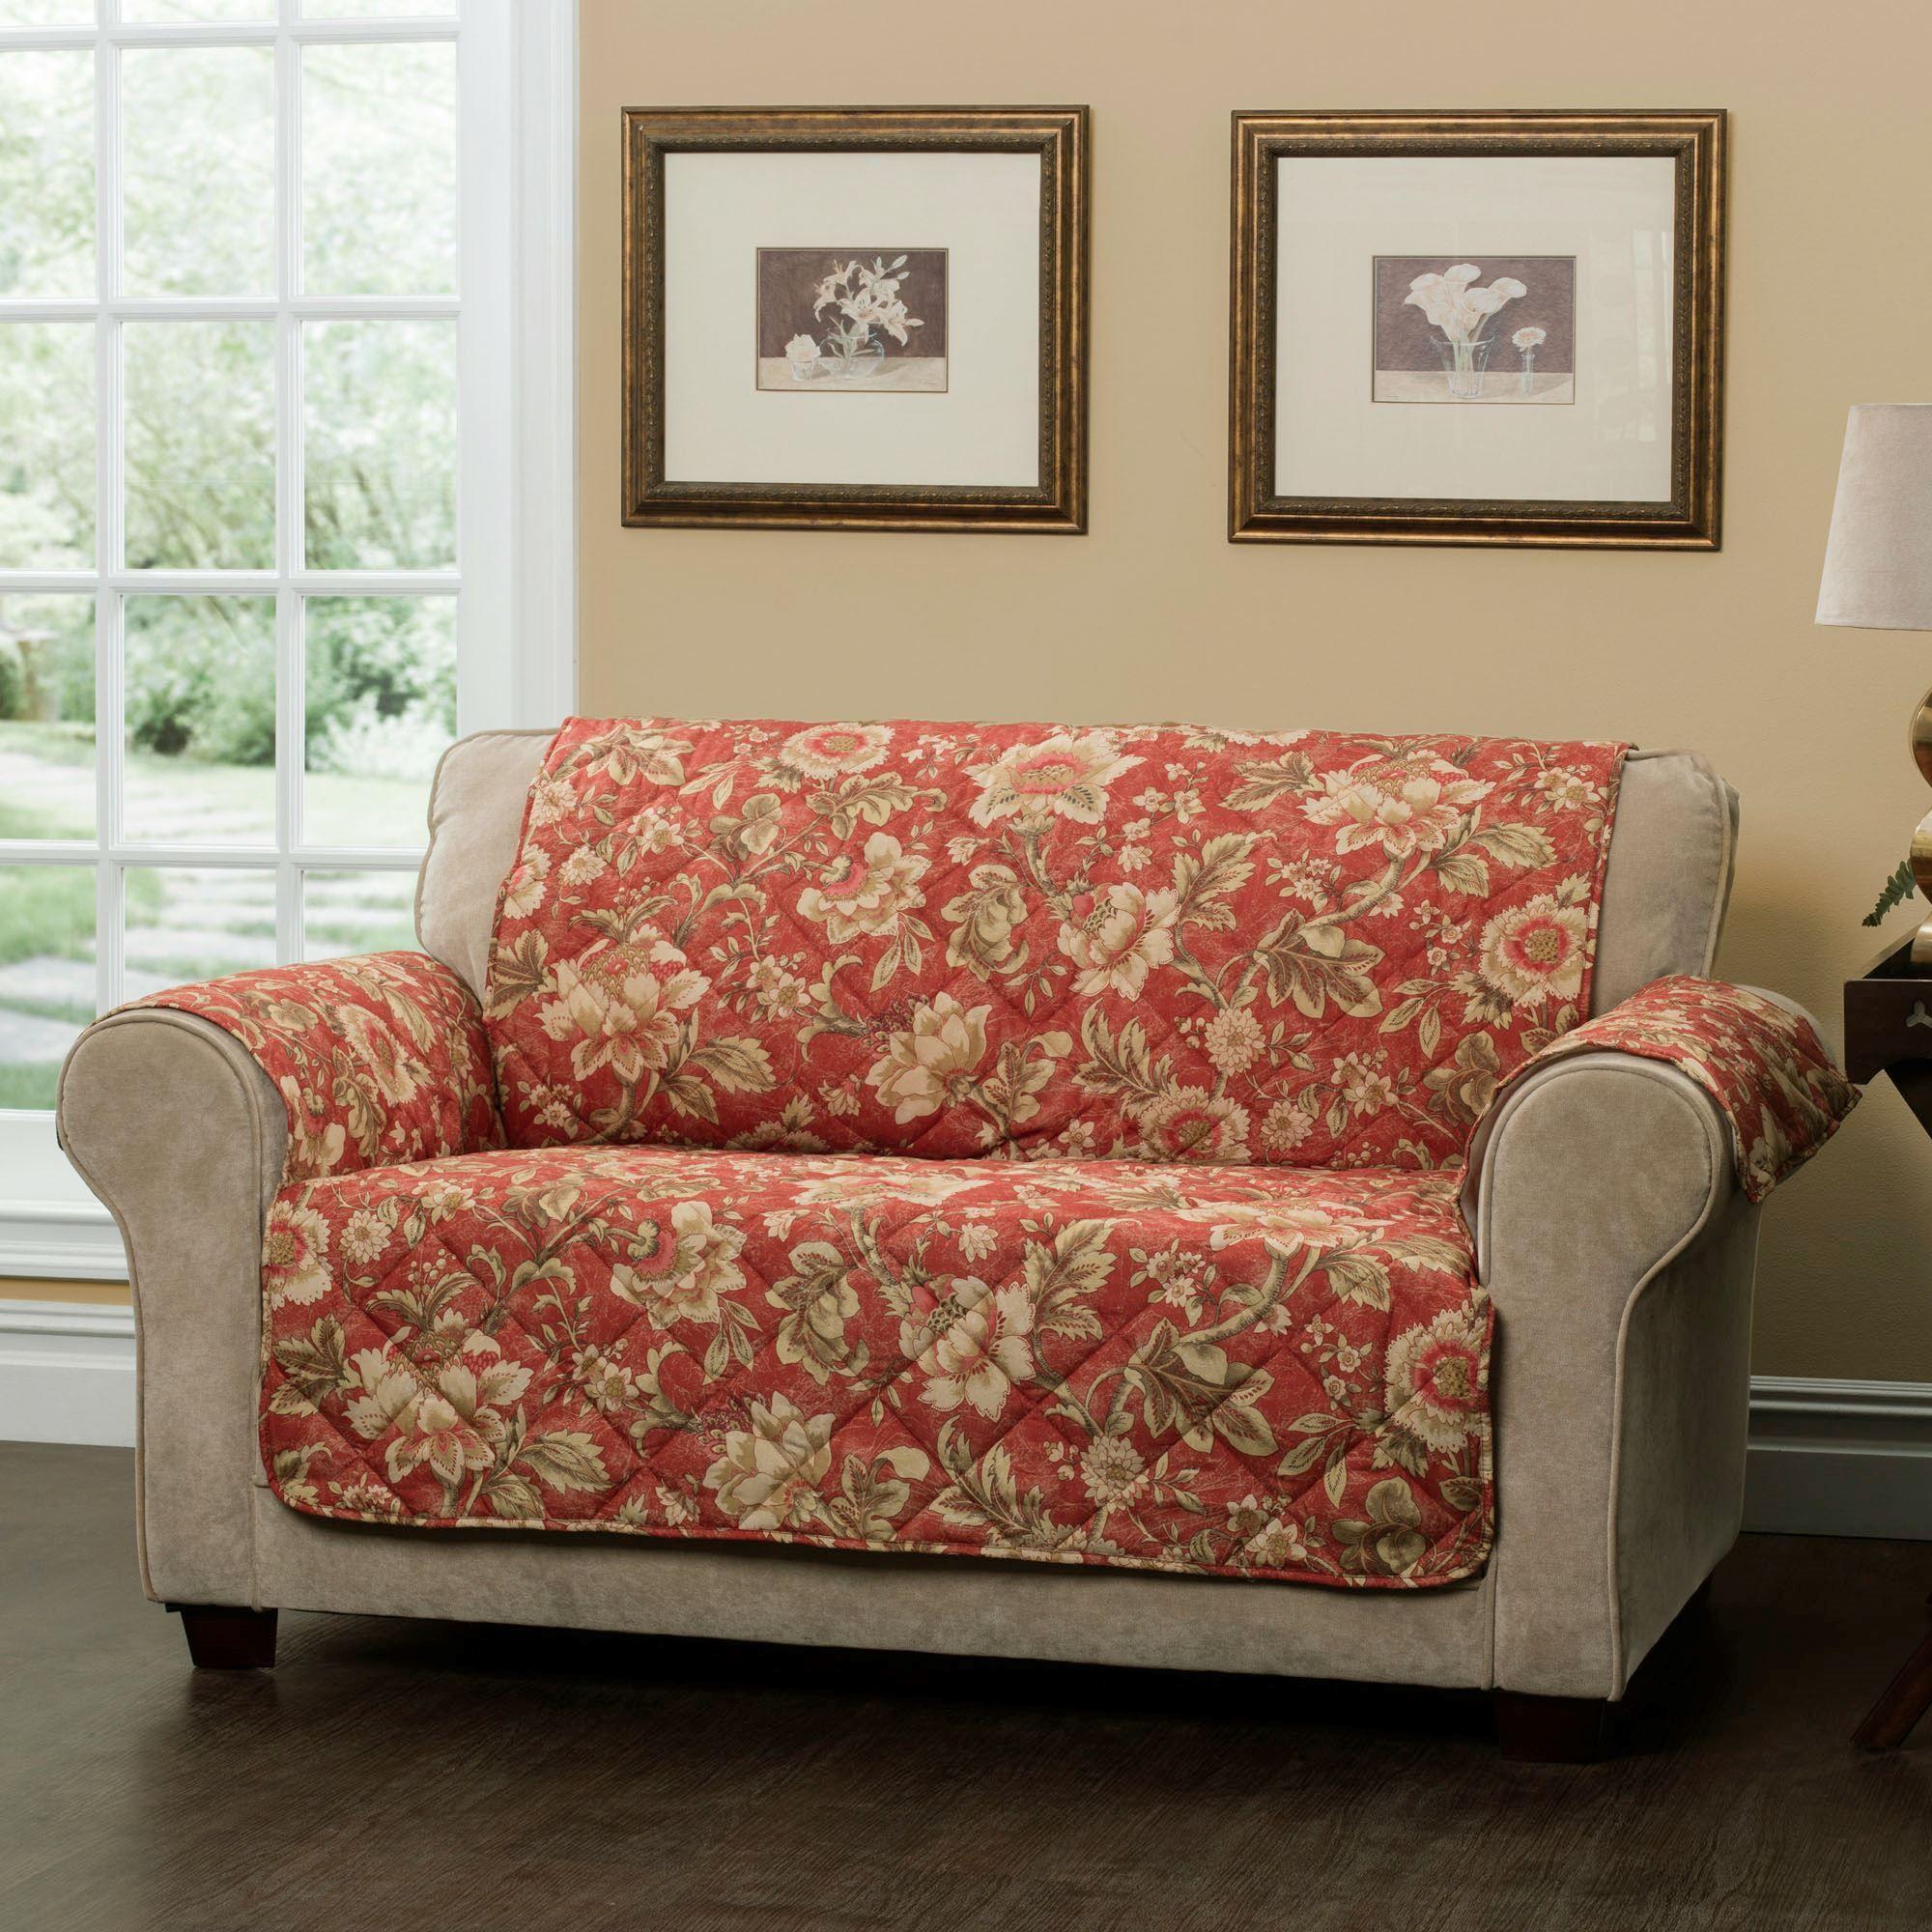 Aviston Sunset Jacobean Floral Furniture Protectors